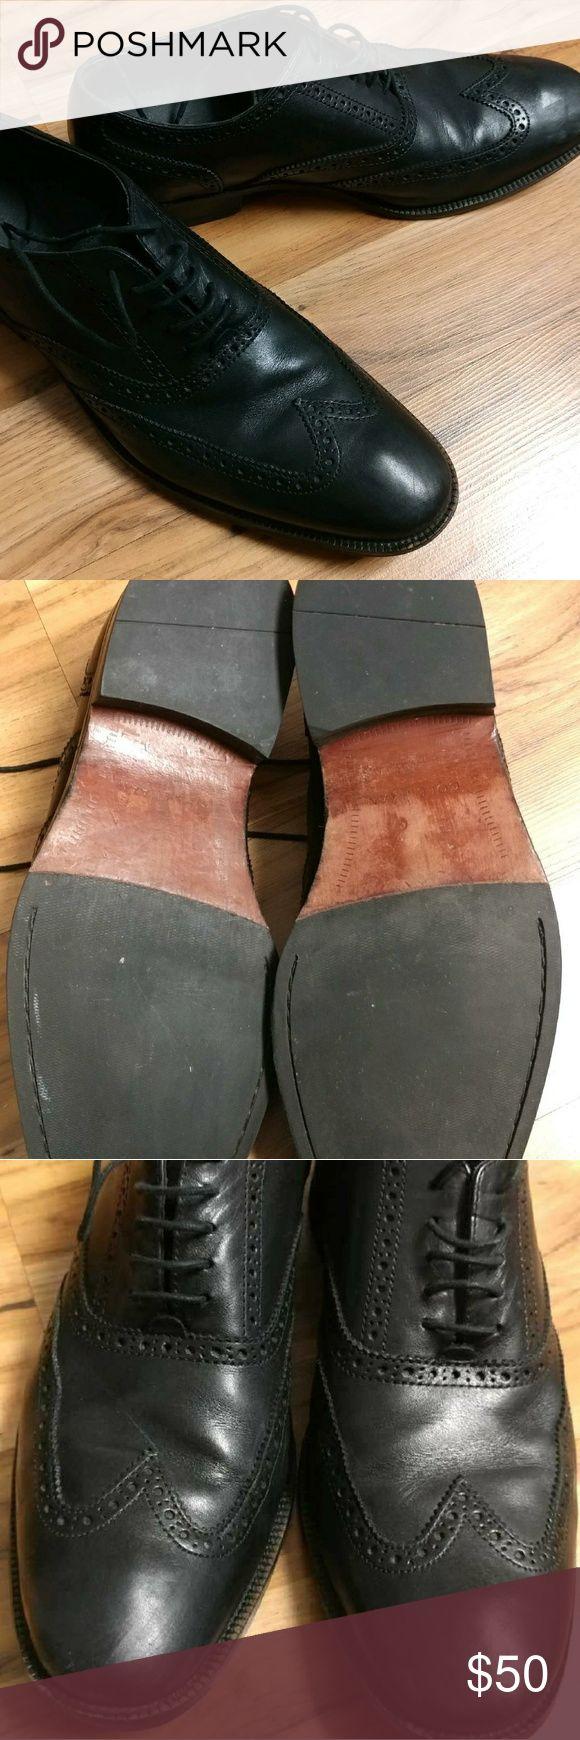 Men's Cole Haan dress shoes Gently used men's Cole Haan shoes, excellent condition Cole Haan Shoes Oxfords & Derbys